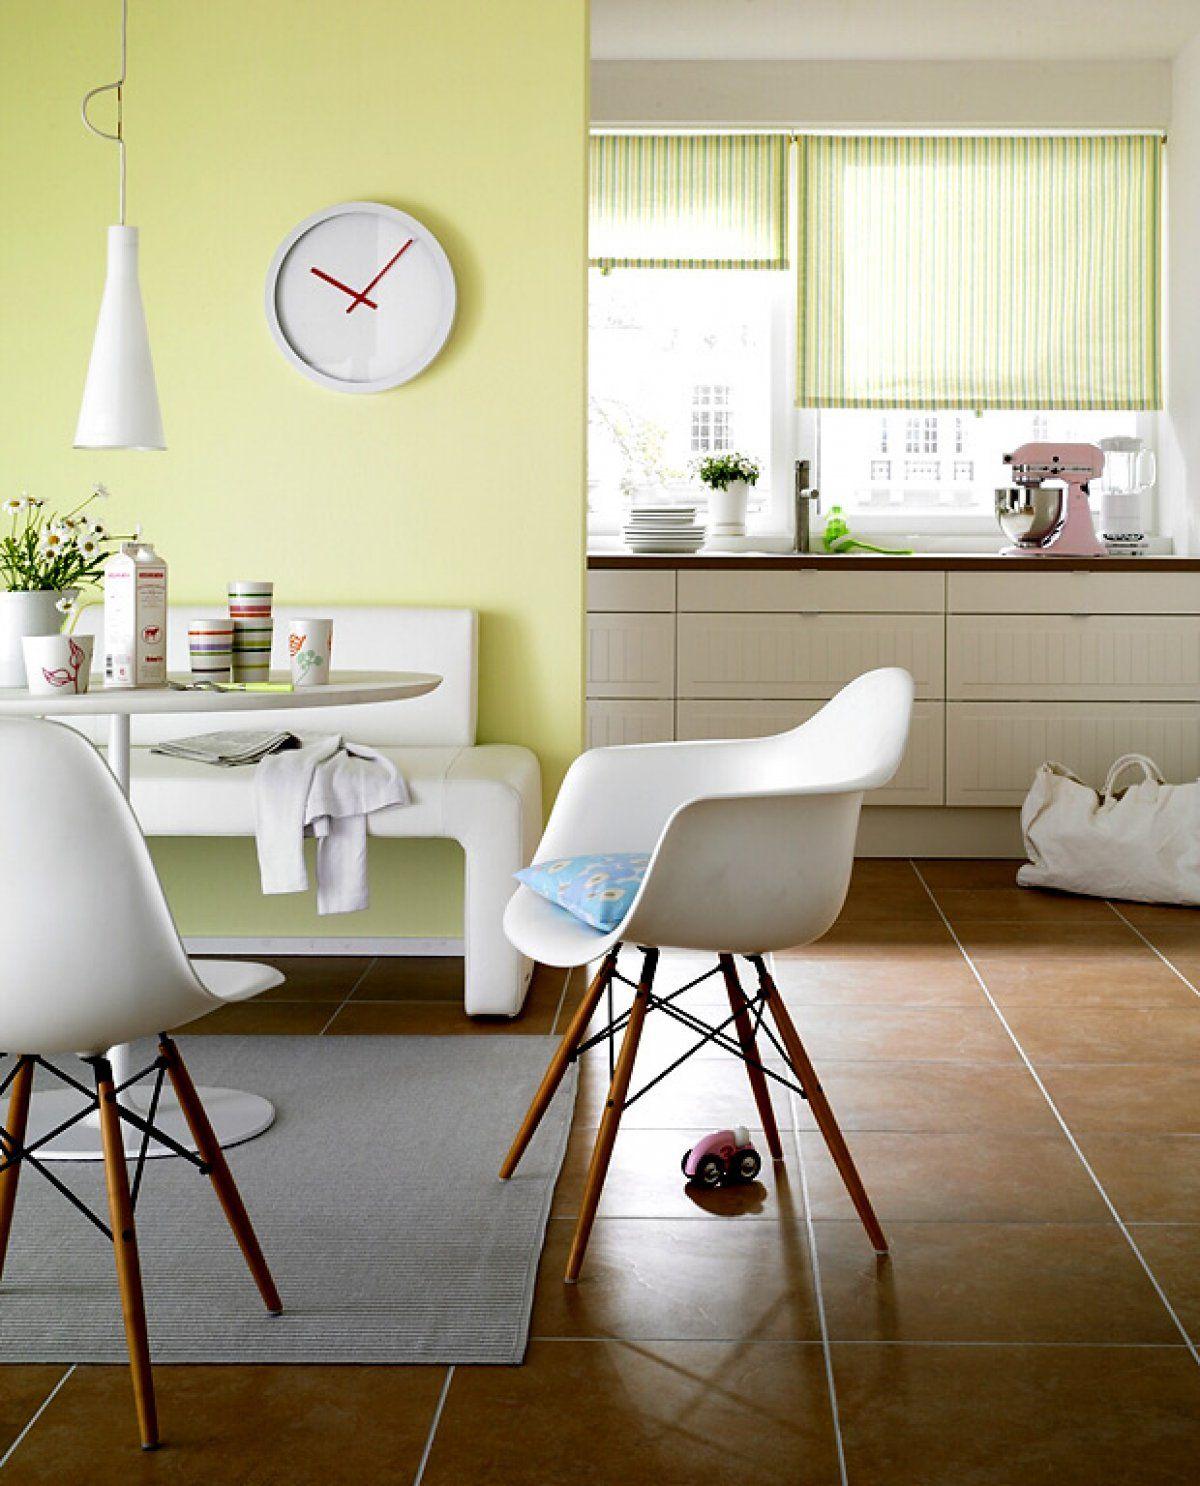 Wände In Frühlingsfarben: Lindgrün, Weiß, Terrakotta